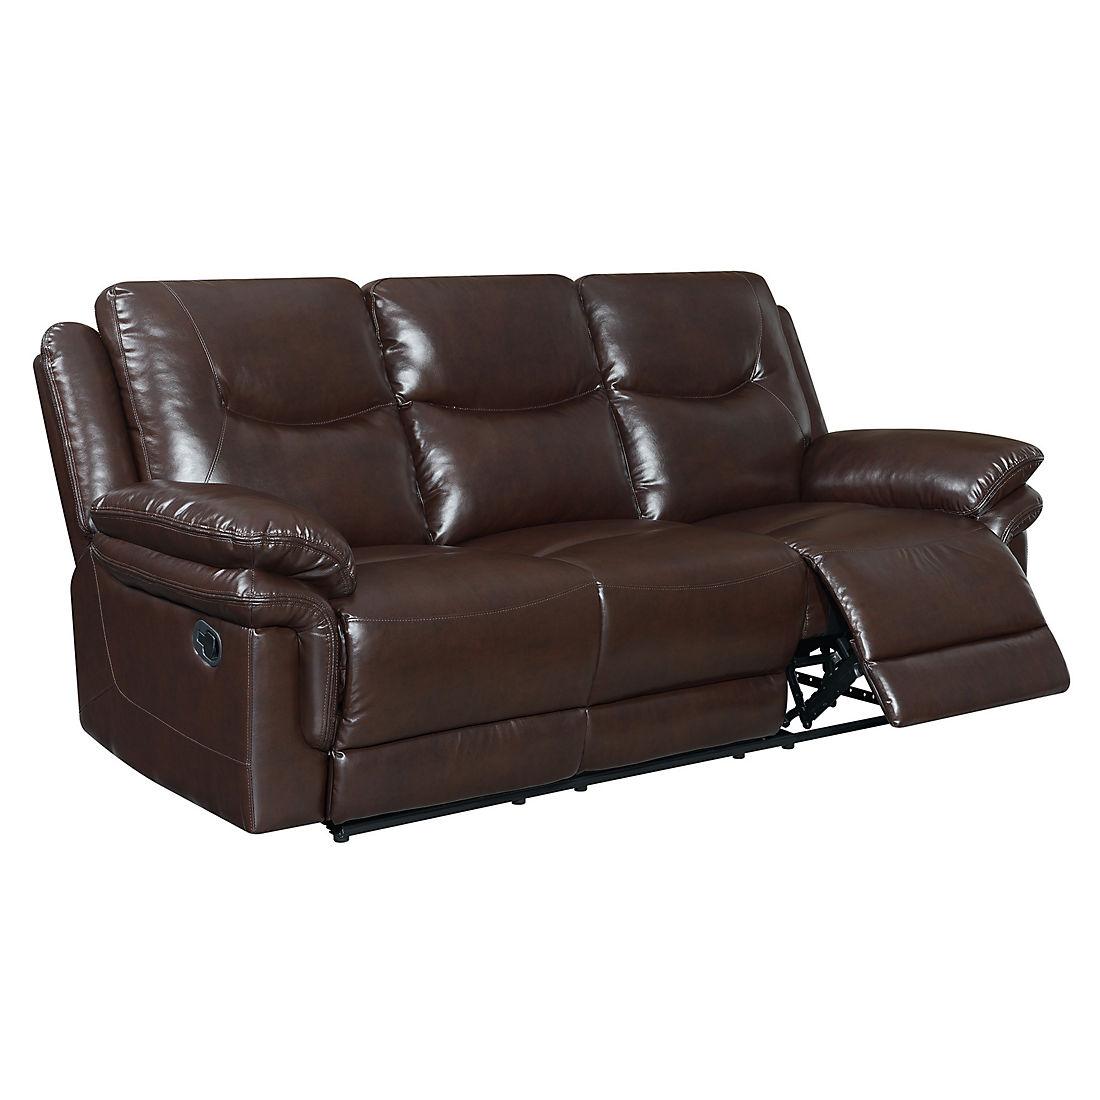 Windsor Reclining Sofa - Brown